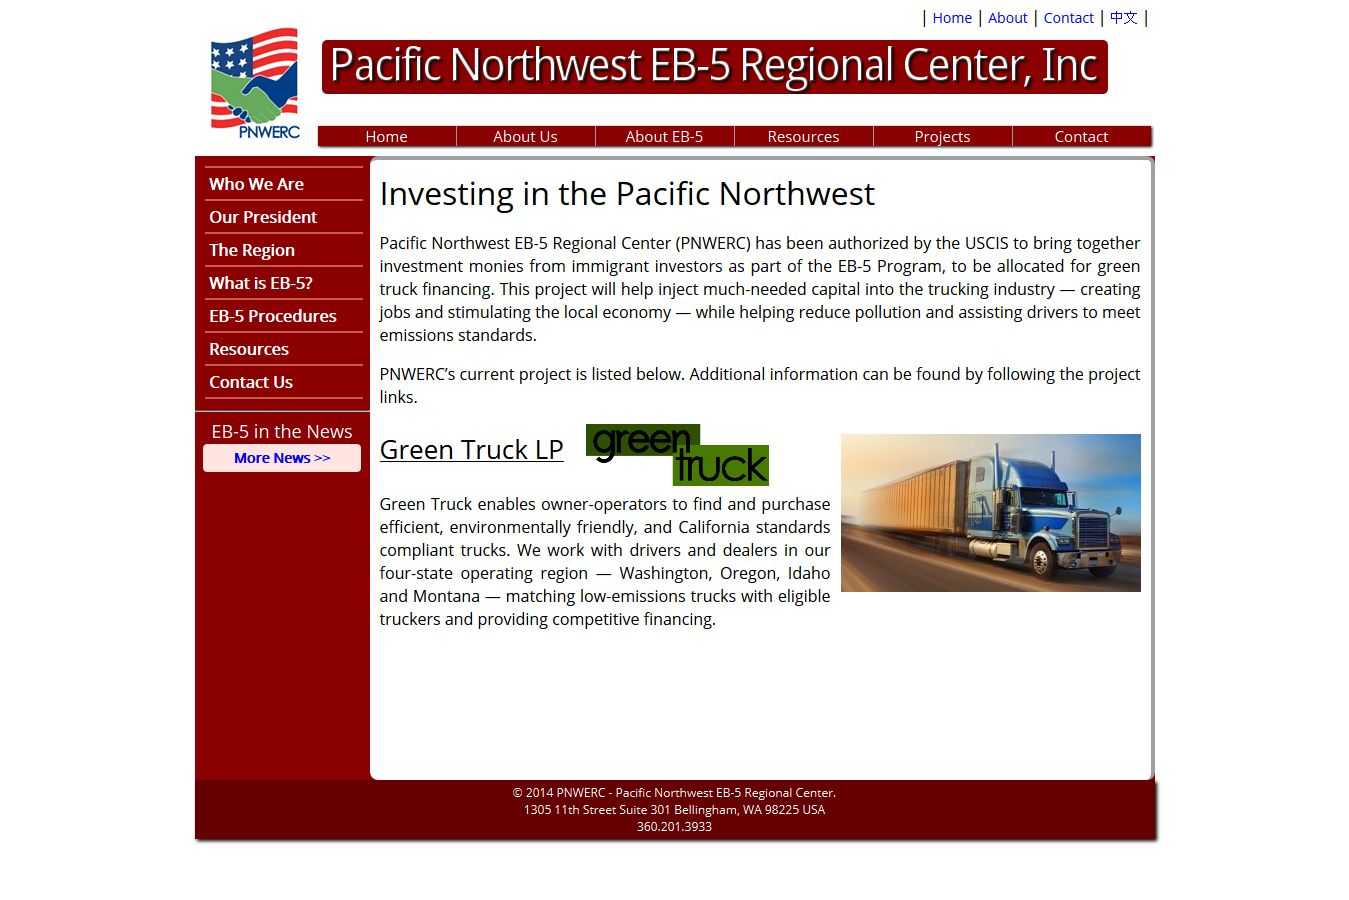 Pacific Northwest EB-5 Regional Center Regional Center